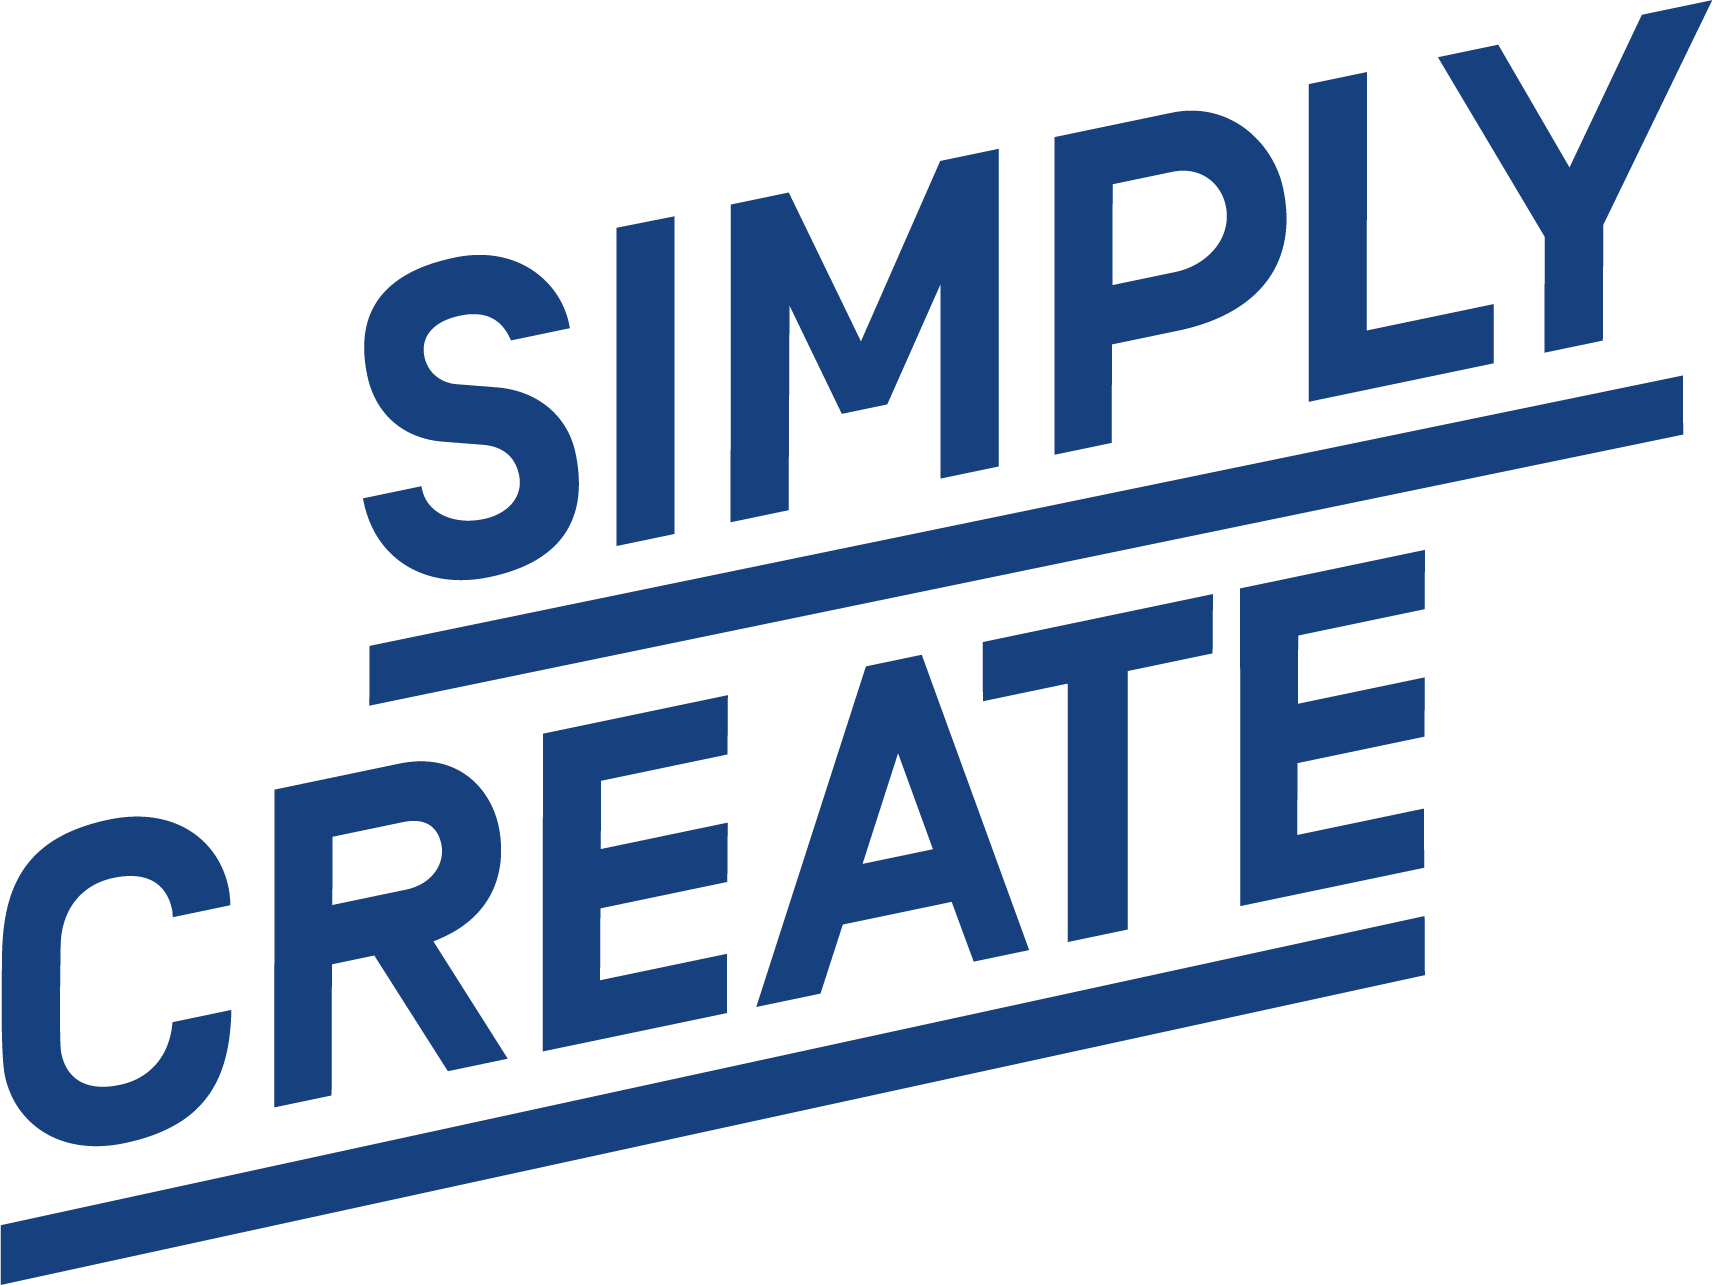 simplycreate